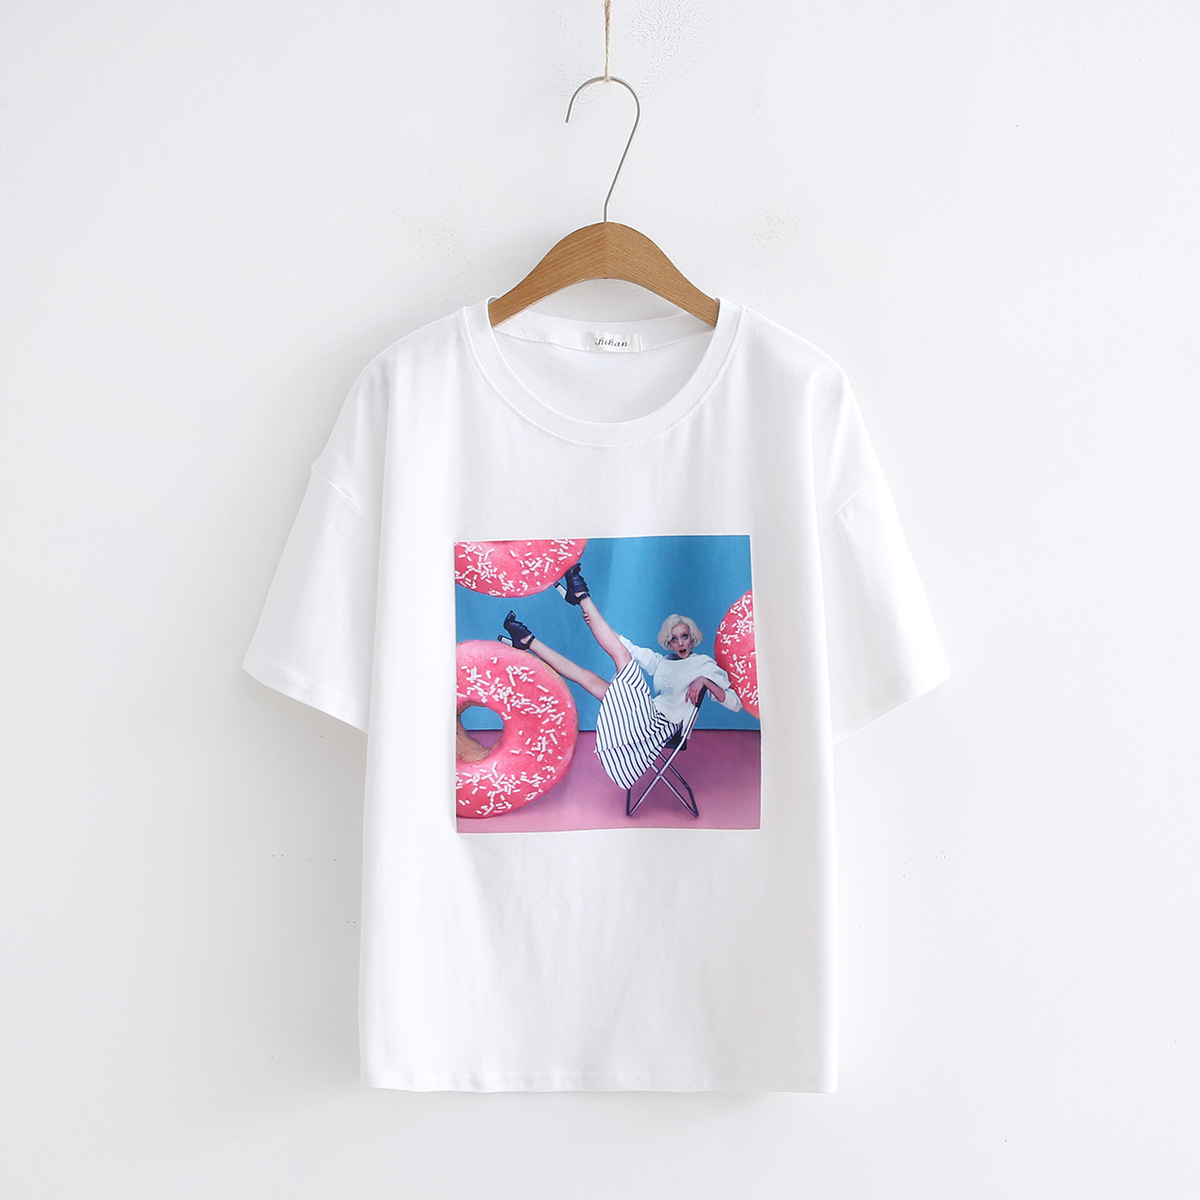 sexy shirt short sleeves students loose fitting cartoon design fresh thin t shirt sweatshirt leisure